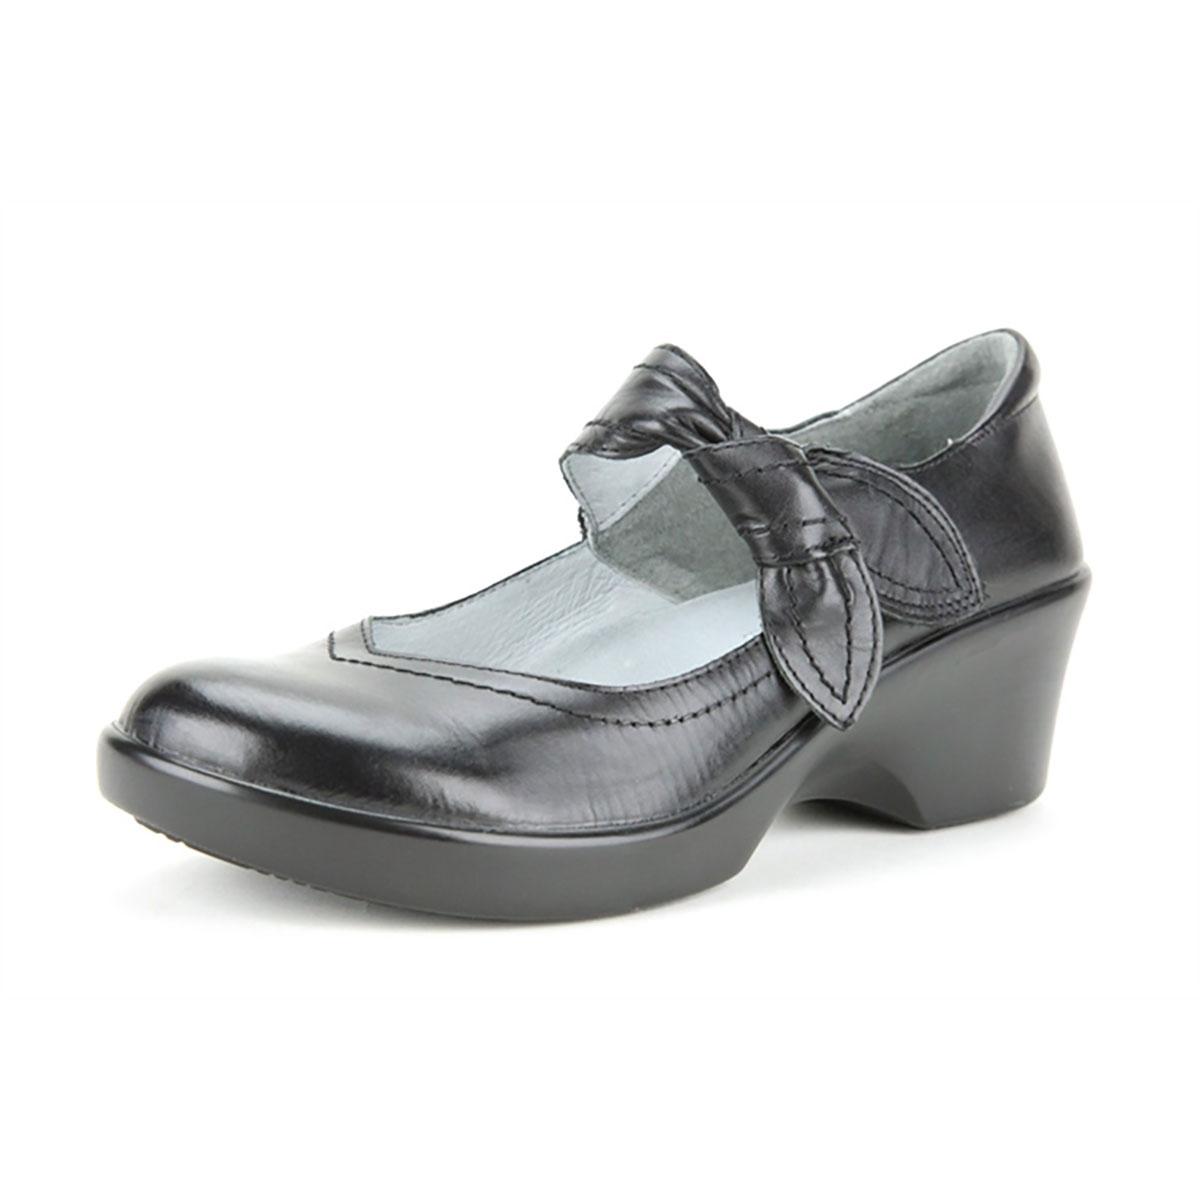 Alegria Ella Black Nappa The Alegria Shoe Experts